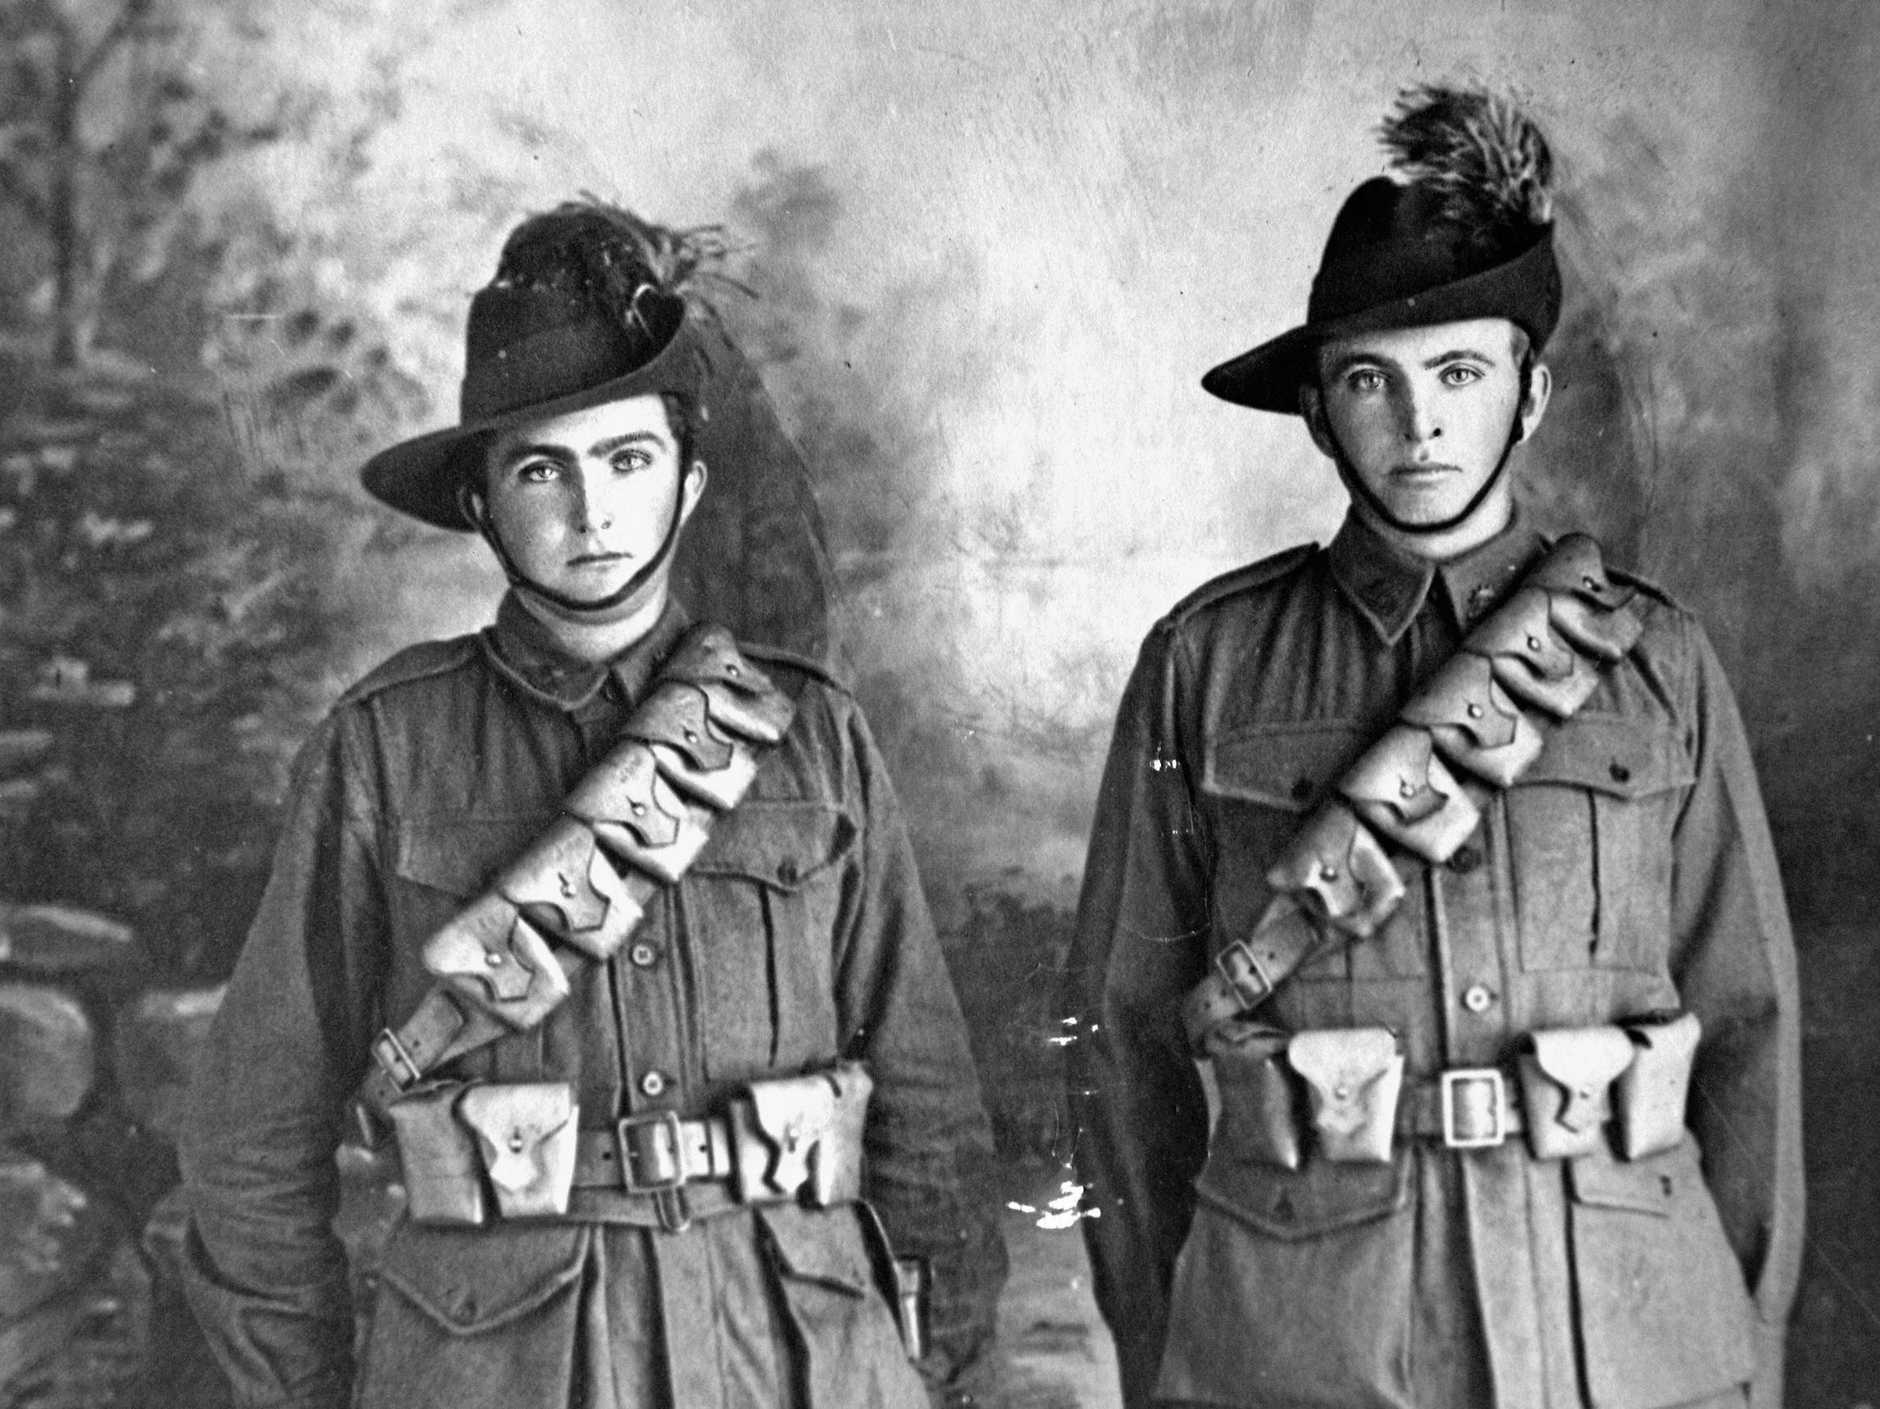 MacleanLight Horseman, Merton and Harold Farlow in uniform. Photo Courtesy Joyce Watson - Farlow Family Album